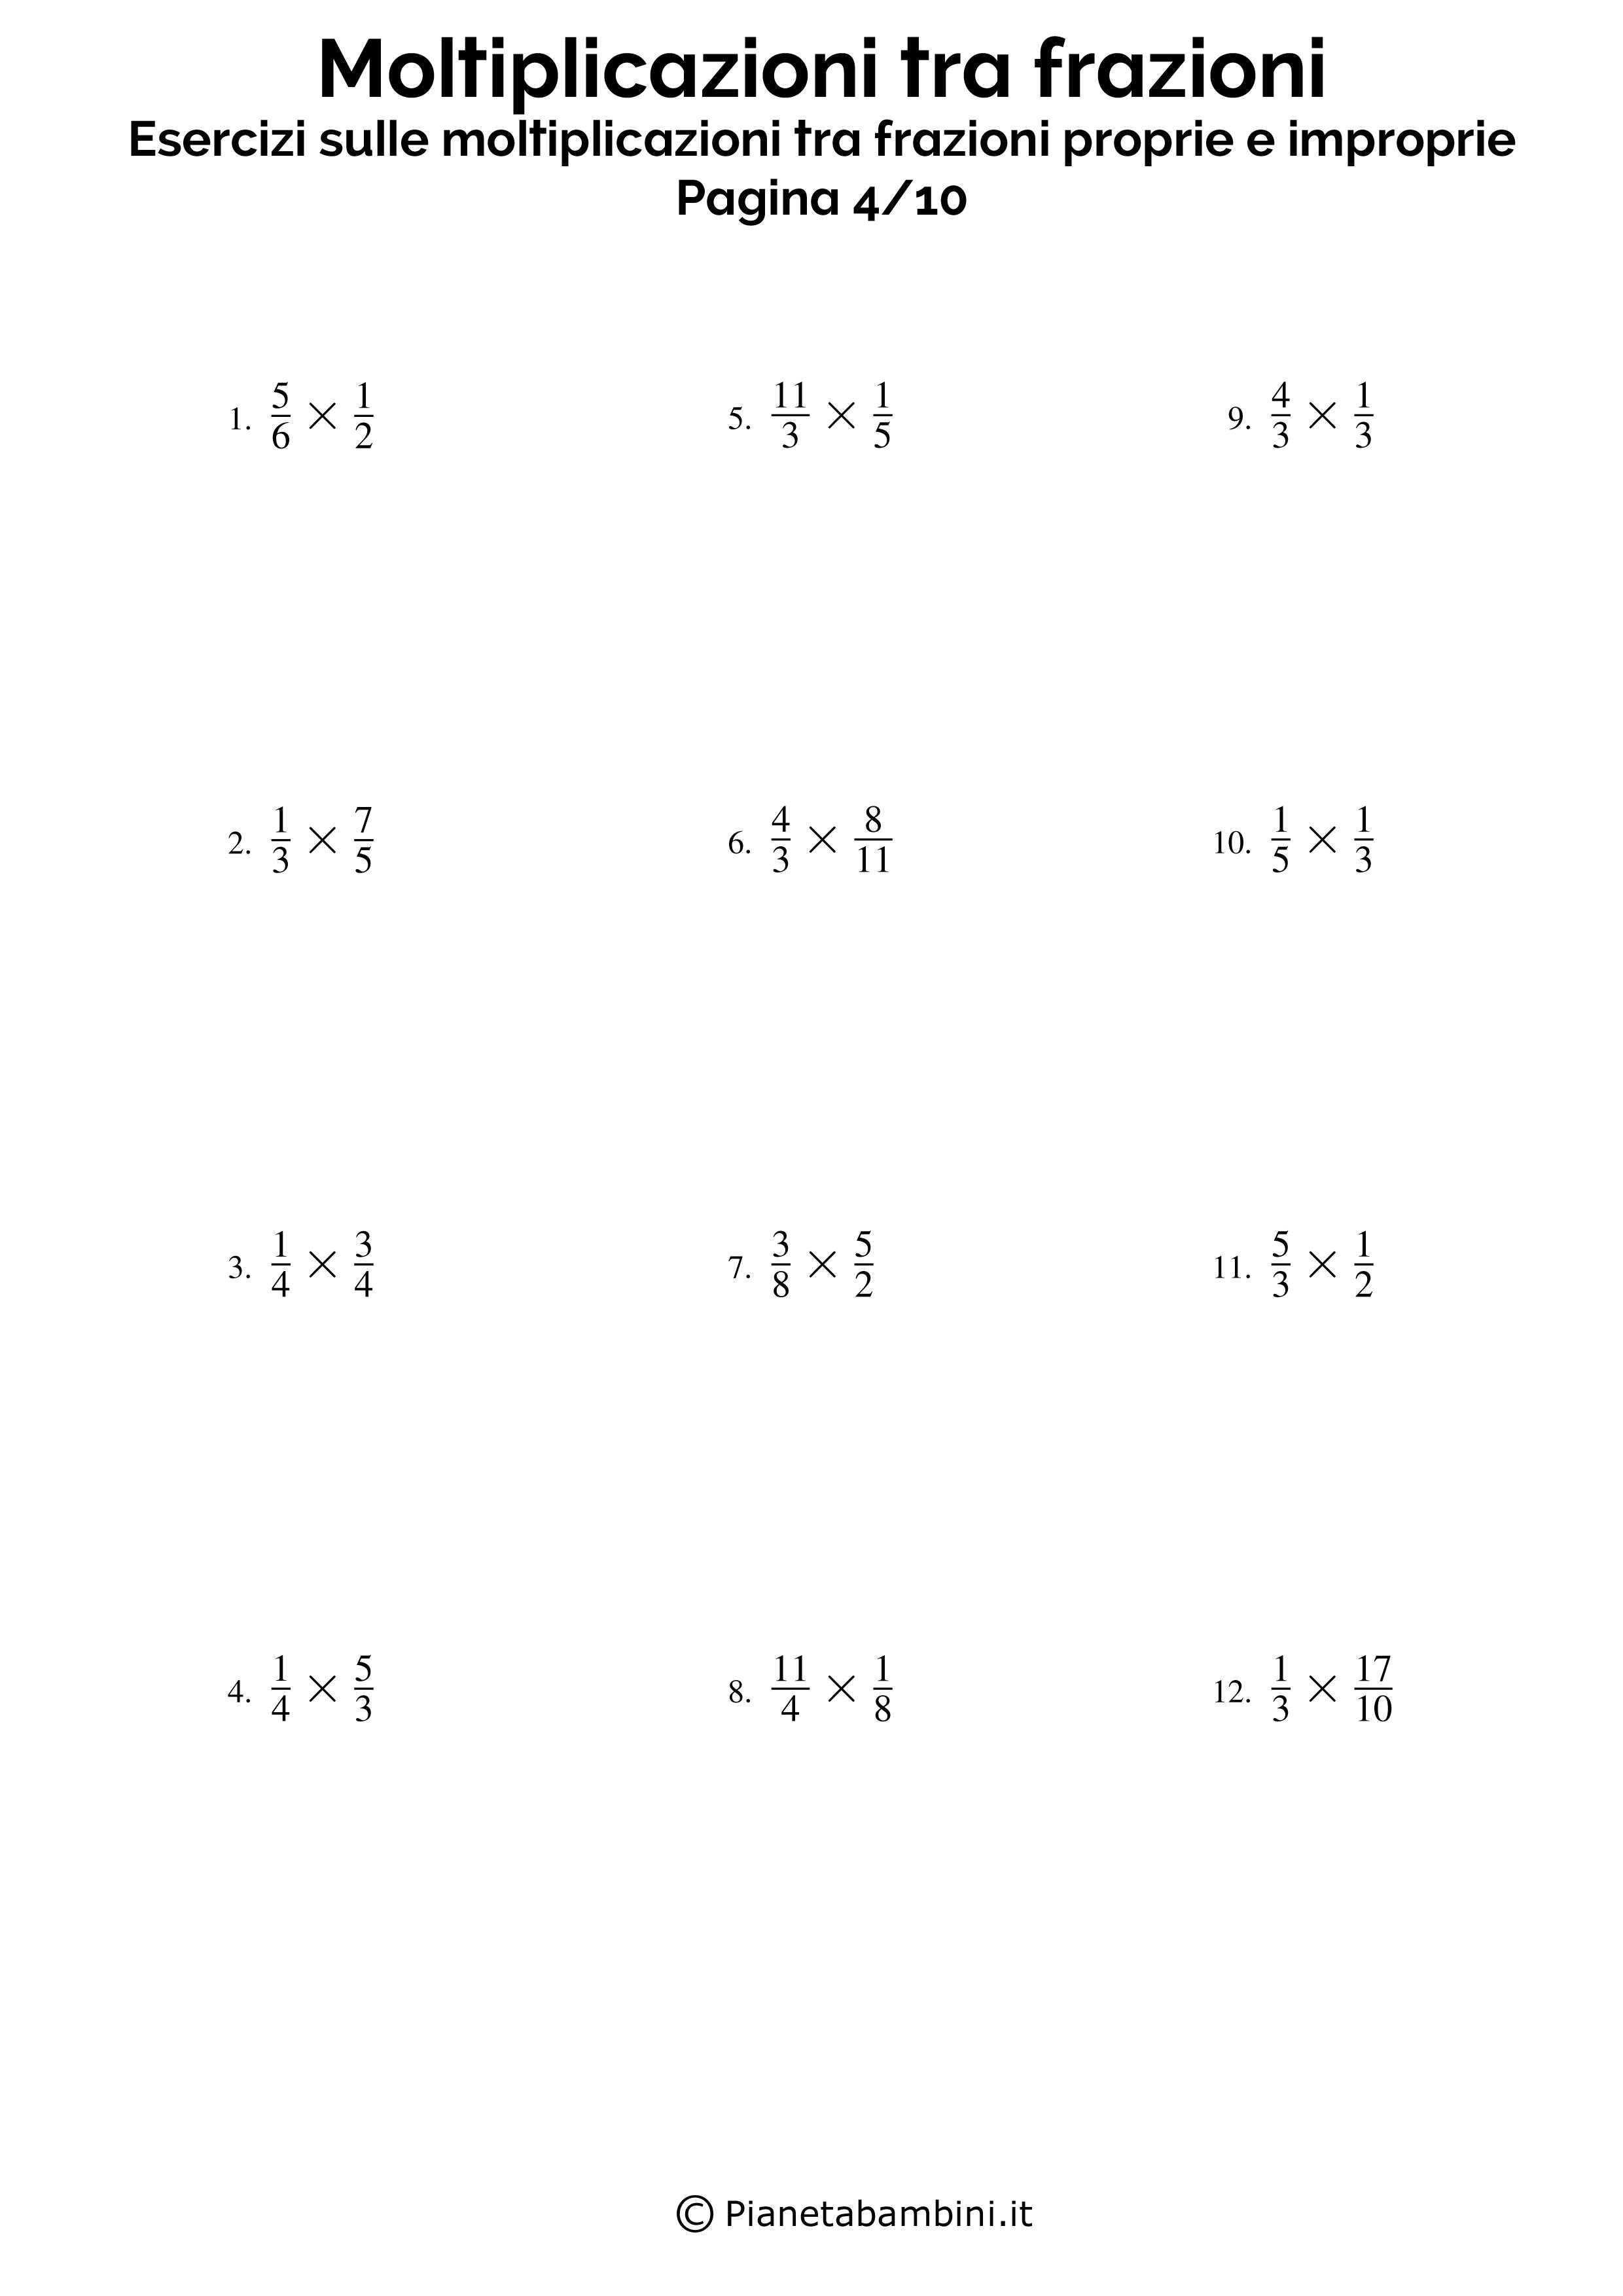 Moltiplicazioni-Frazioni-Proprie-Improprie_04